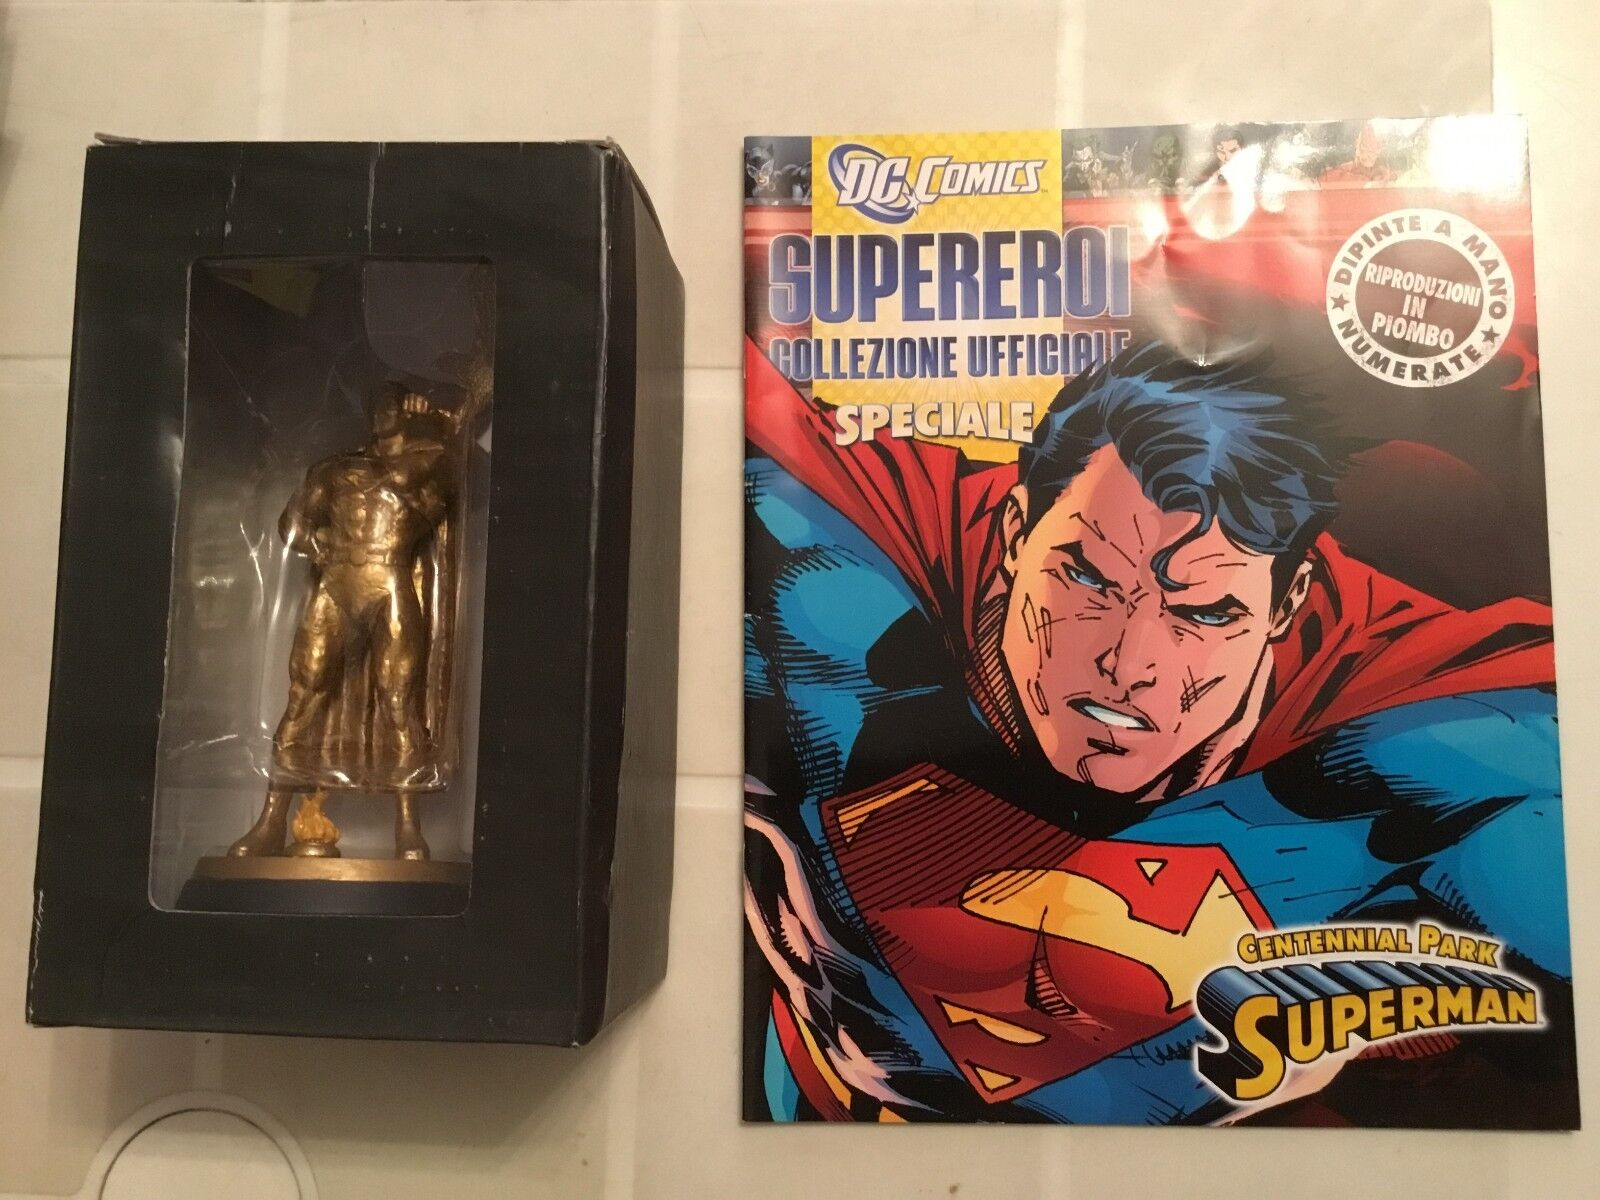 DC SUPEREROI COLLEZIONE SPECIALE SUPERMAN CENTENNIAL PARK Statua+Fasc EAGLEMOSS